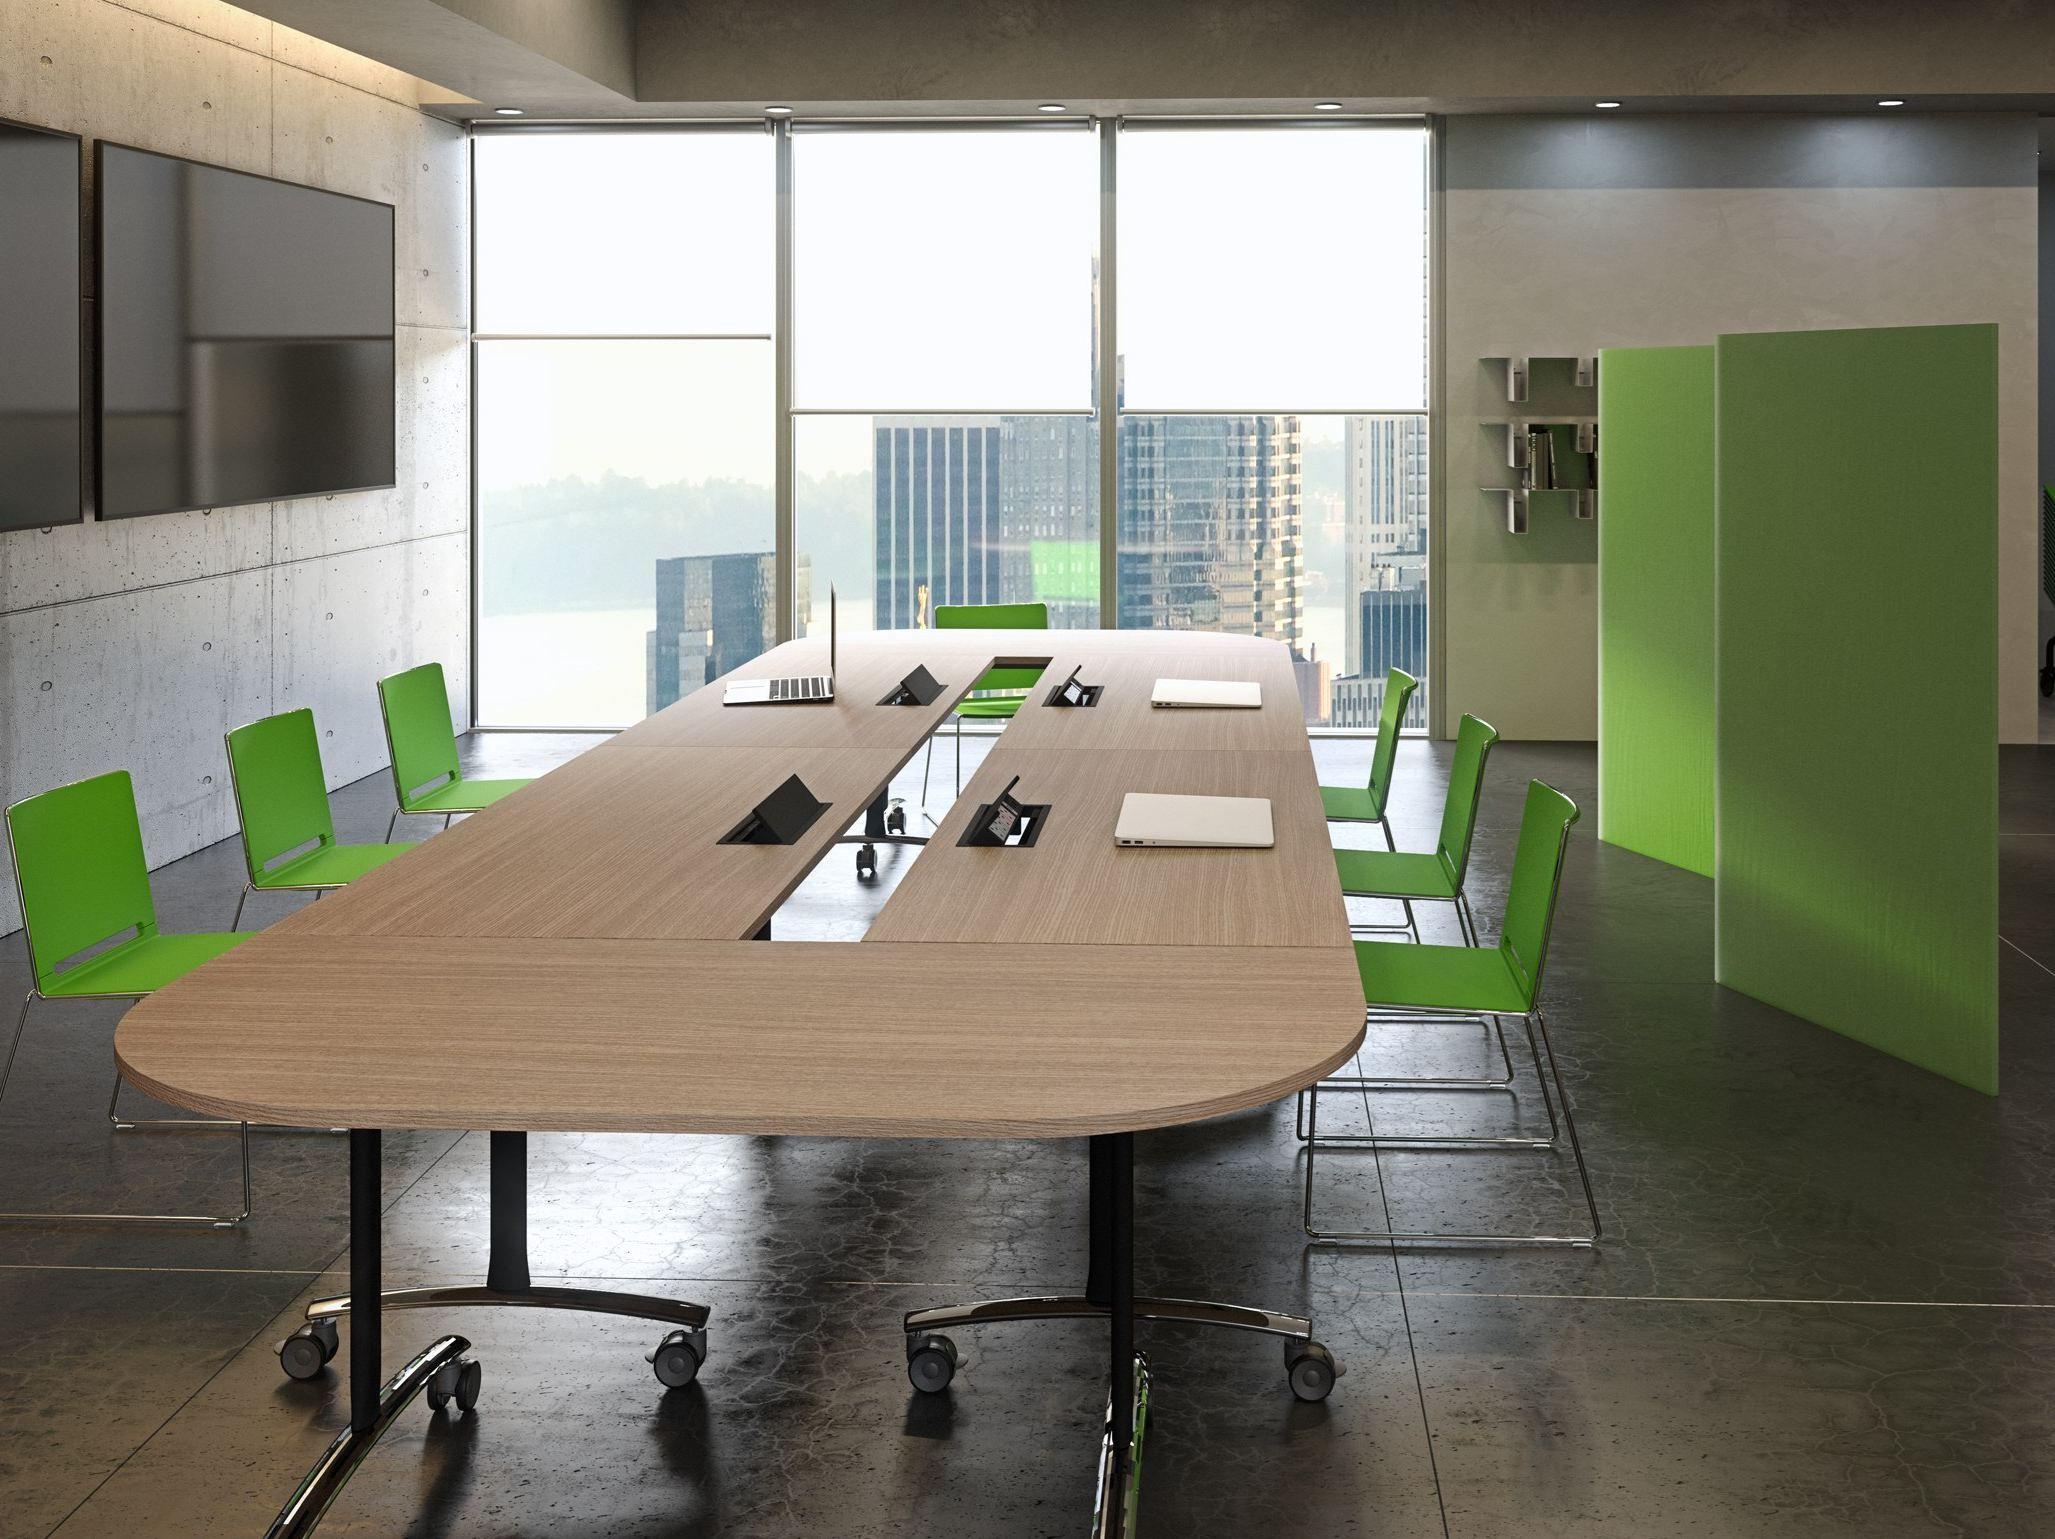 archimede table de r union by ibebi design angelo pinaffo. Black Bedroom Furniture Sets. Home Design Ideas